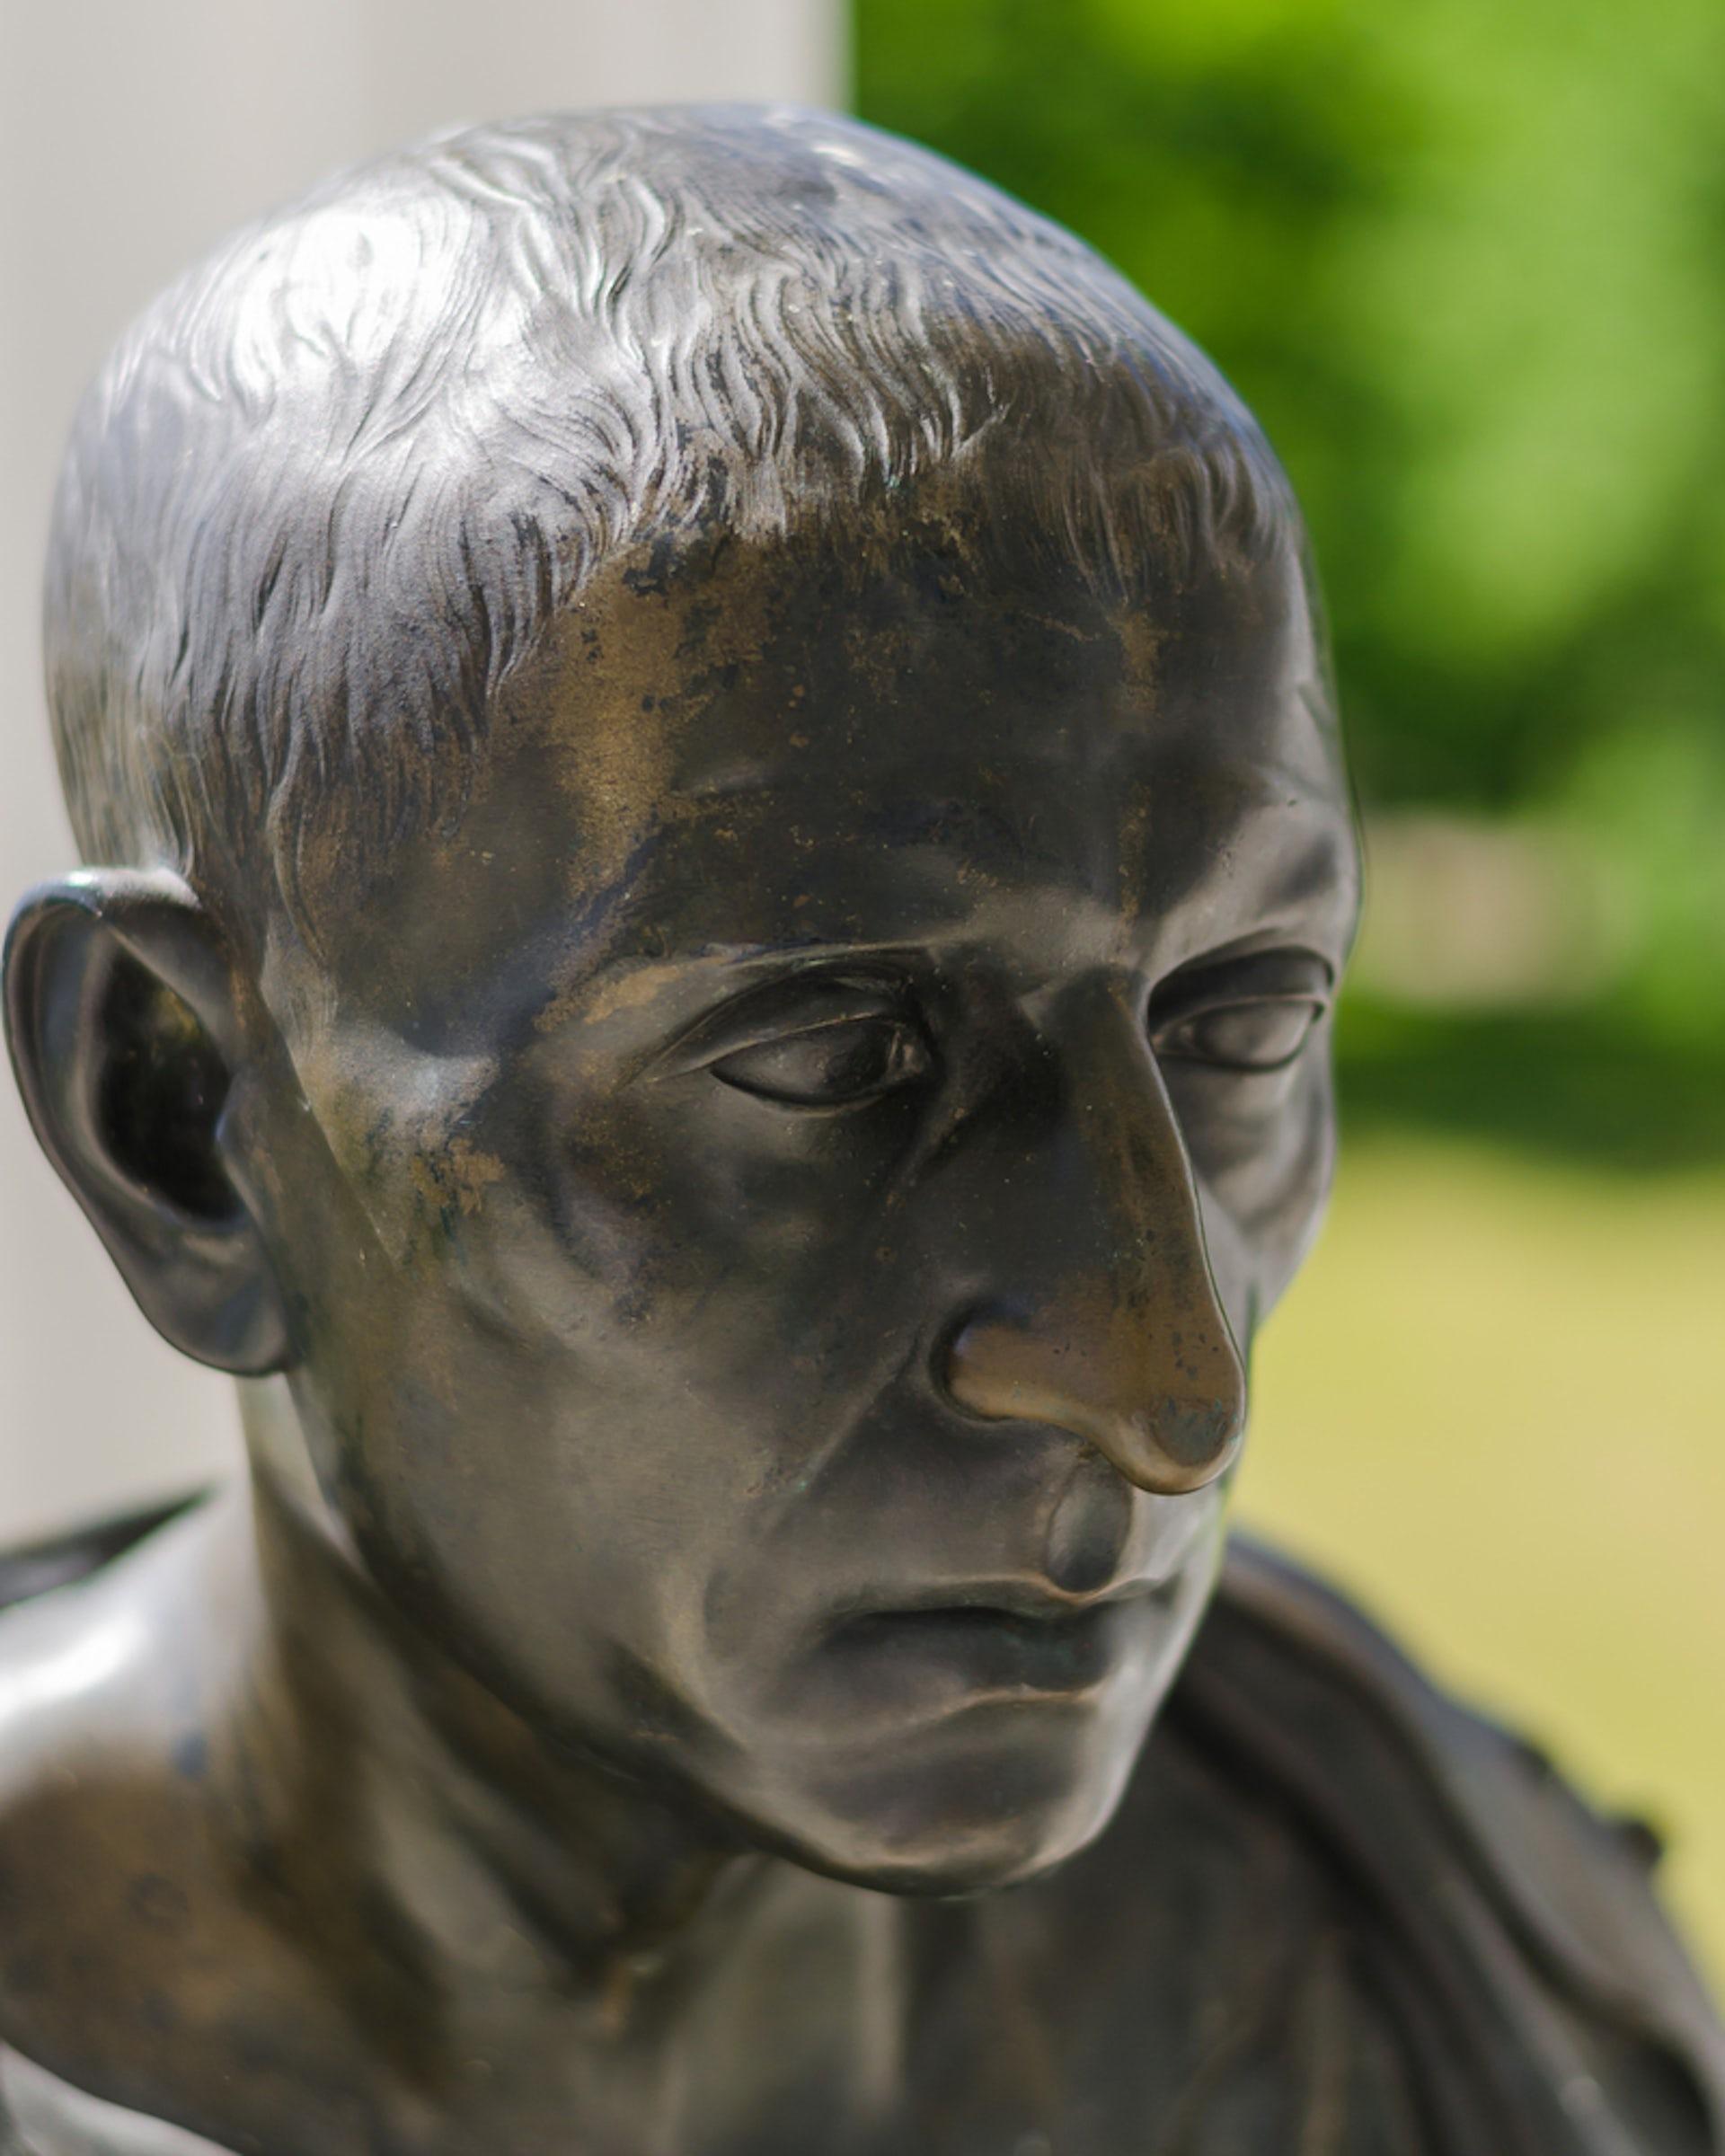 Ancient Roman politician Cicero. Shutterstock/sibfox